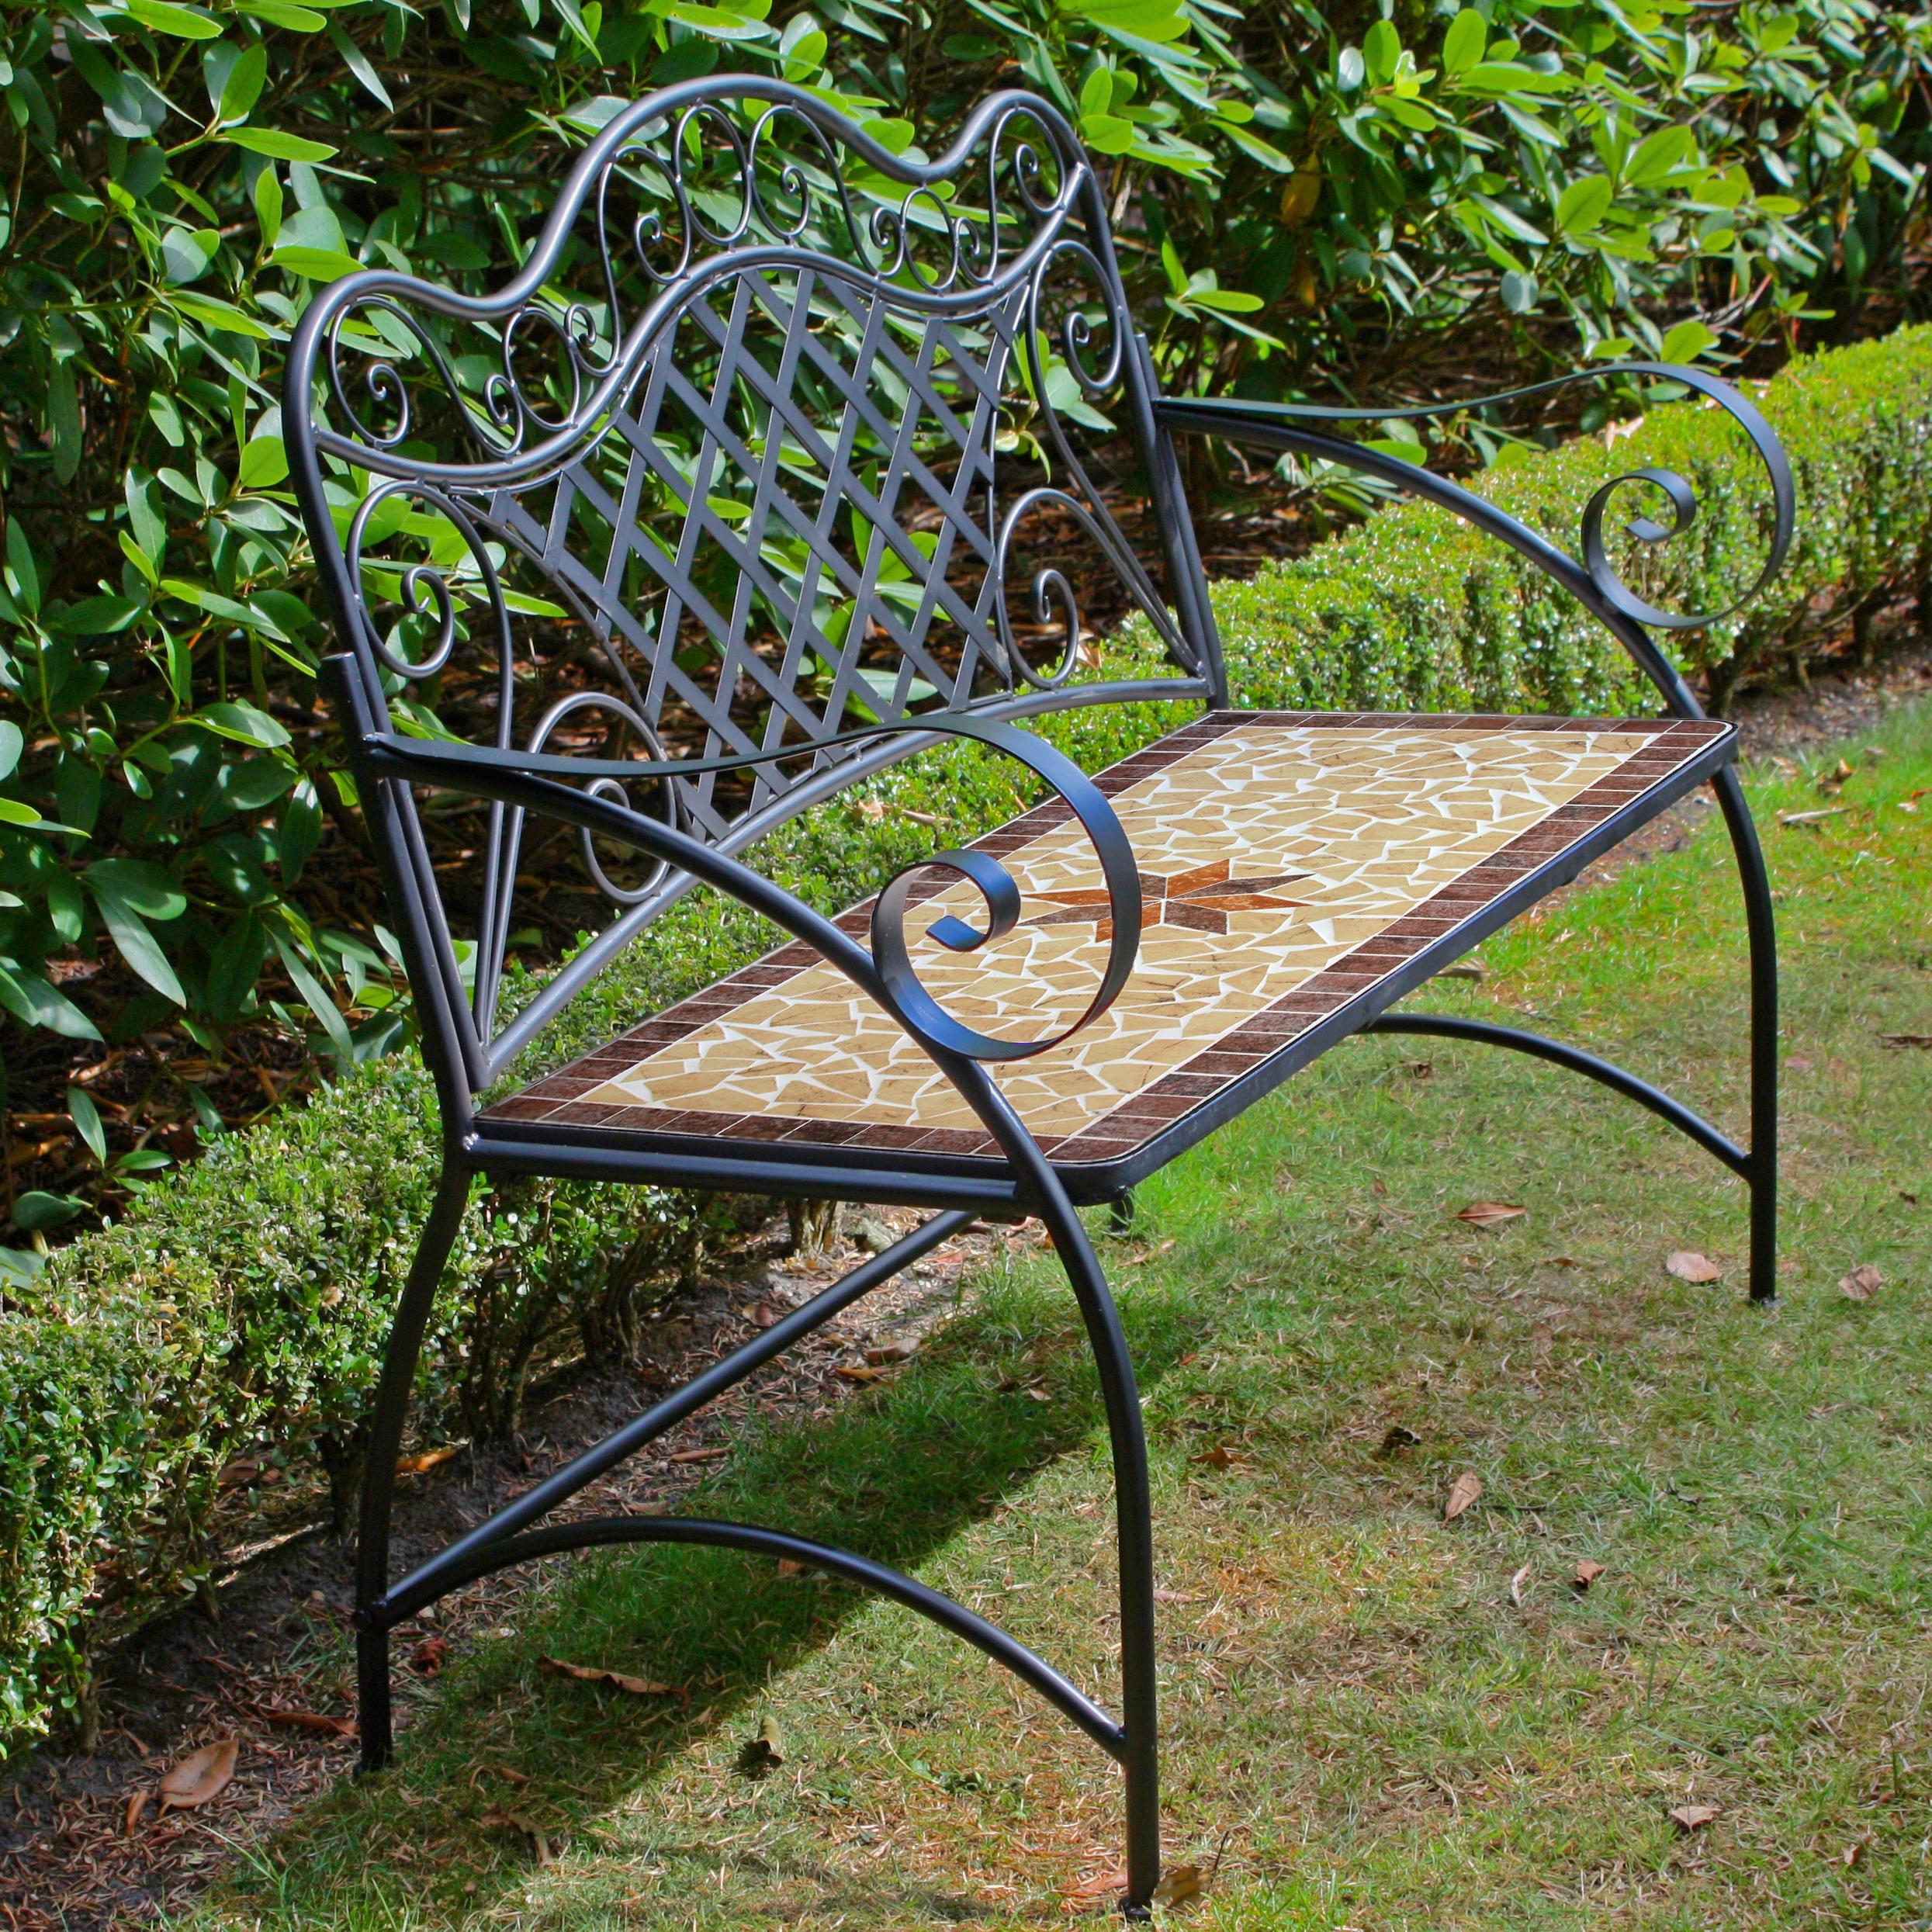 GARDEN PLEASURE Gartenbank Amarillo Stahl 115x57 cm